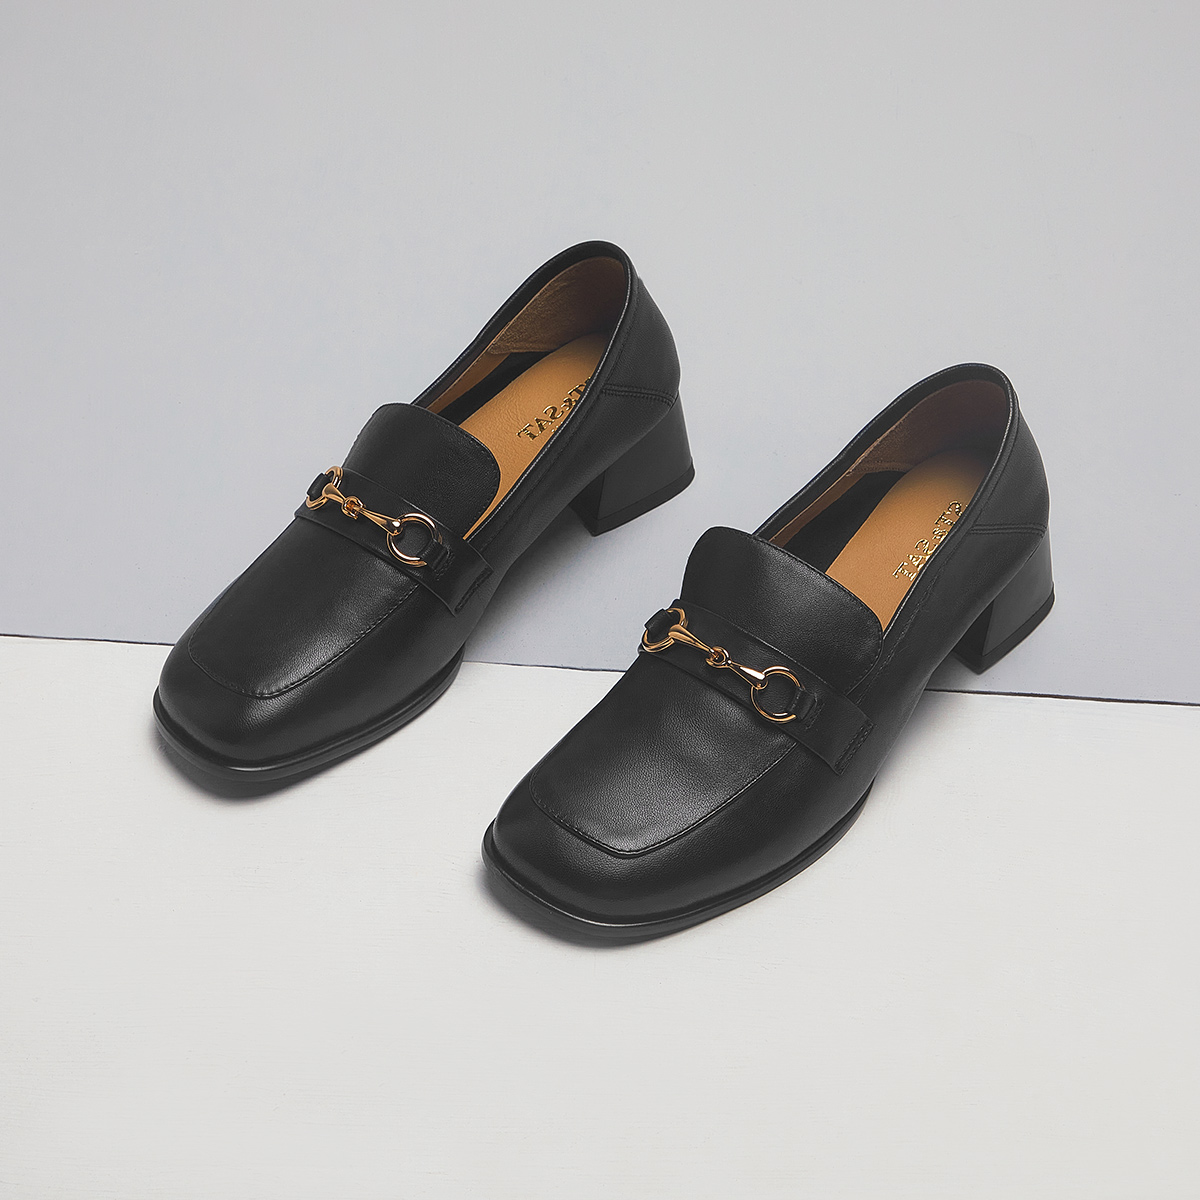 SS13111103 秋季新款方头粗跟马衔扣女鞋 2021 星期六奶油鞋